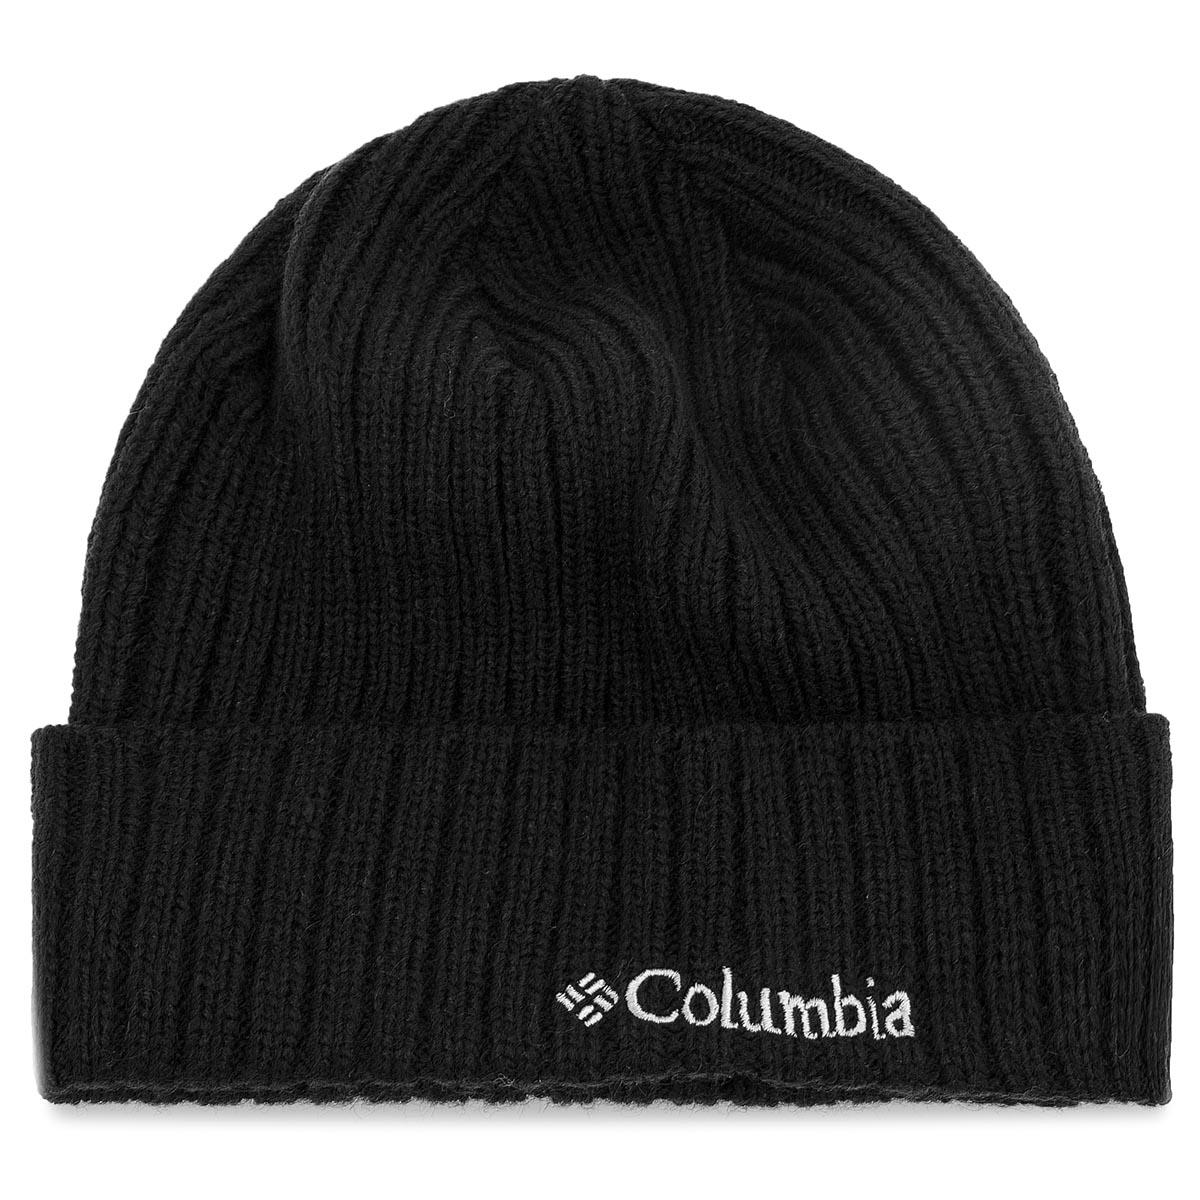 dca9c9afbfa1 Sapka COLUMBIA - Watch Cap 1464091 Black/Black 013 - Glami.hu